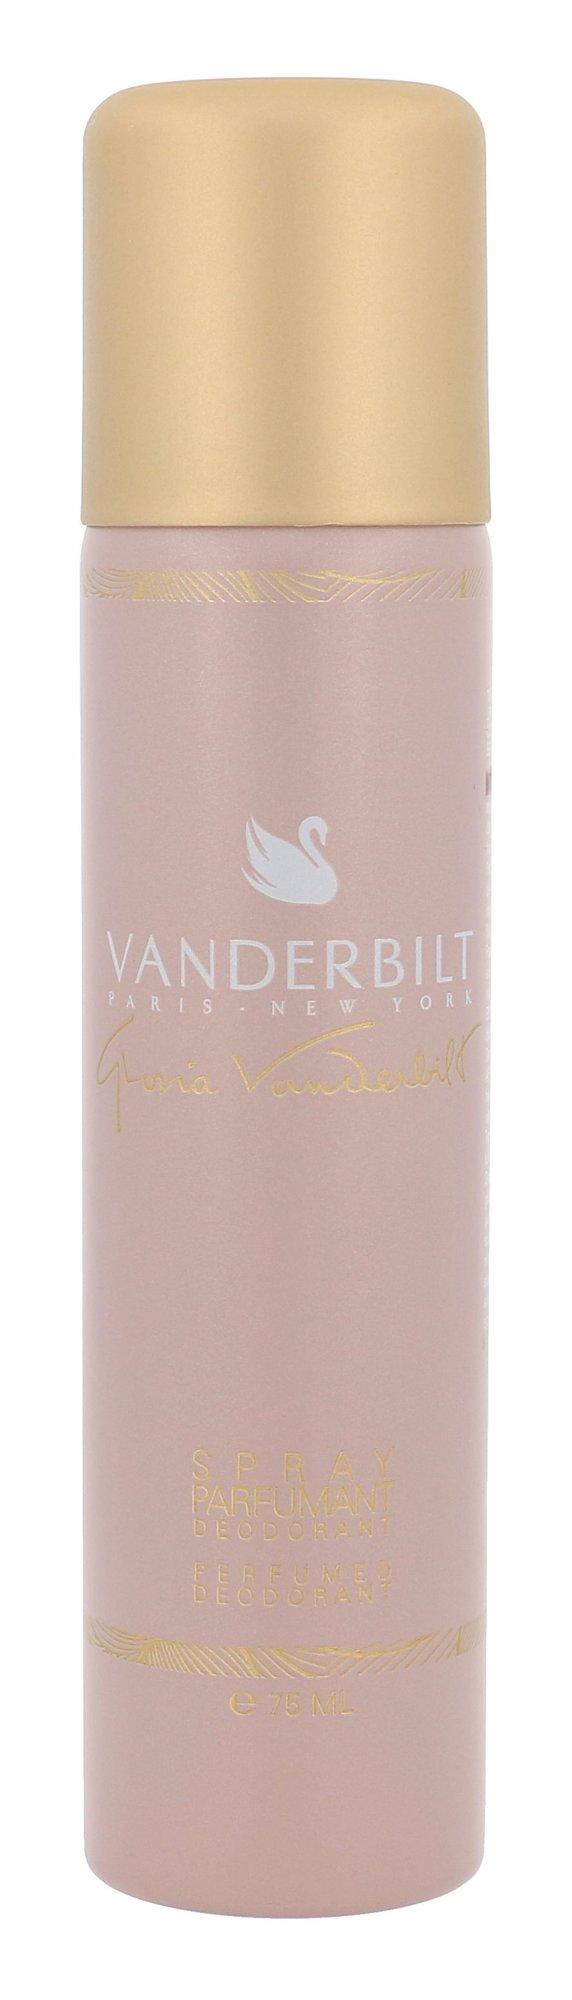 Gloria Vanderbilt Vanderbilt Deodorant 75ml